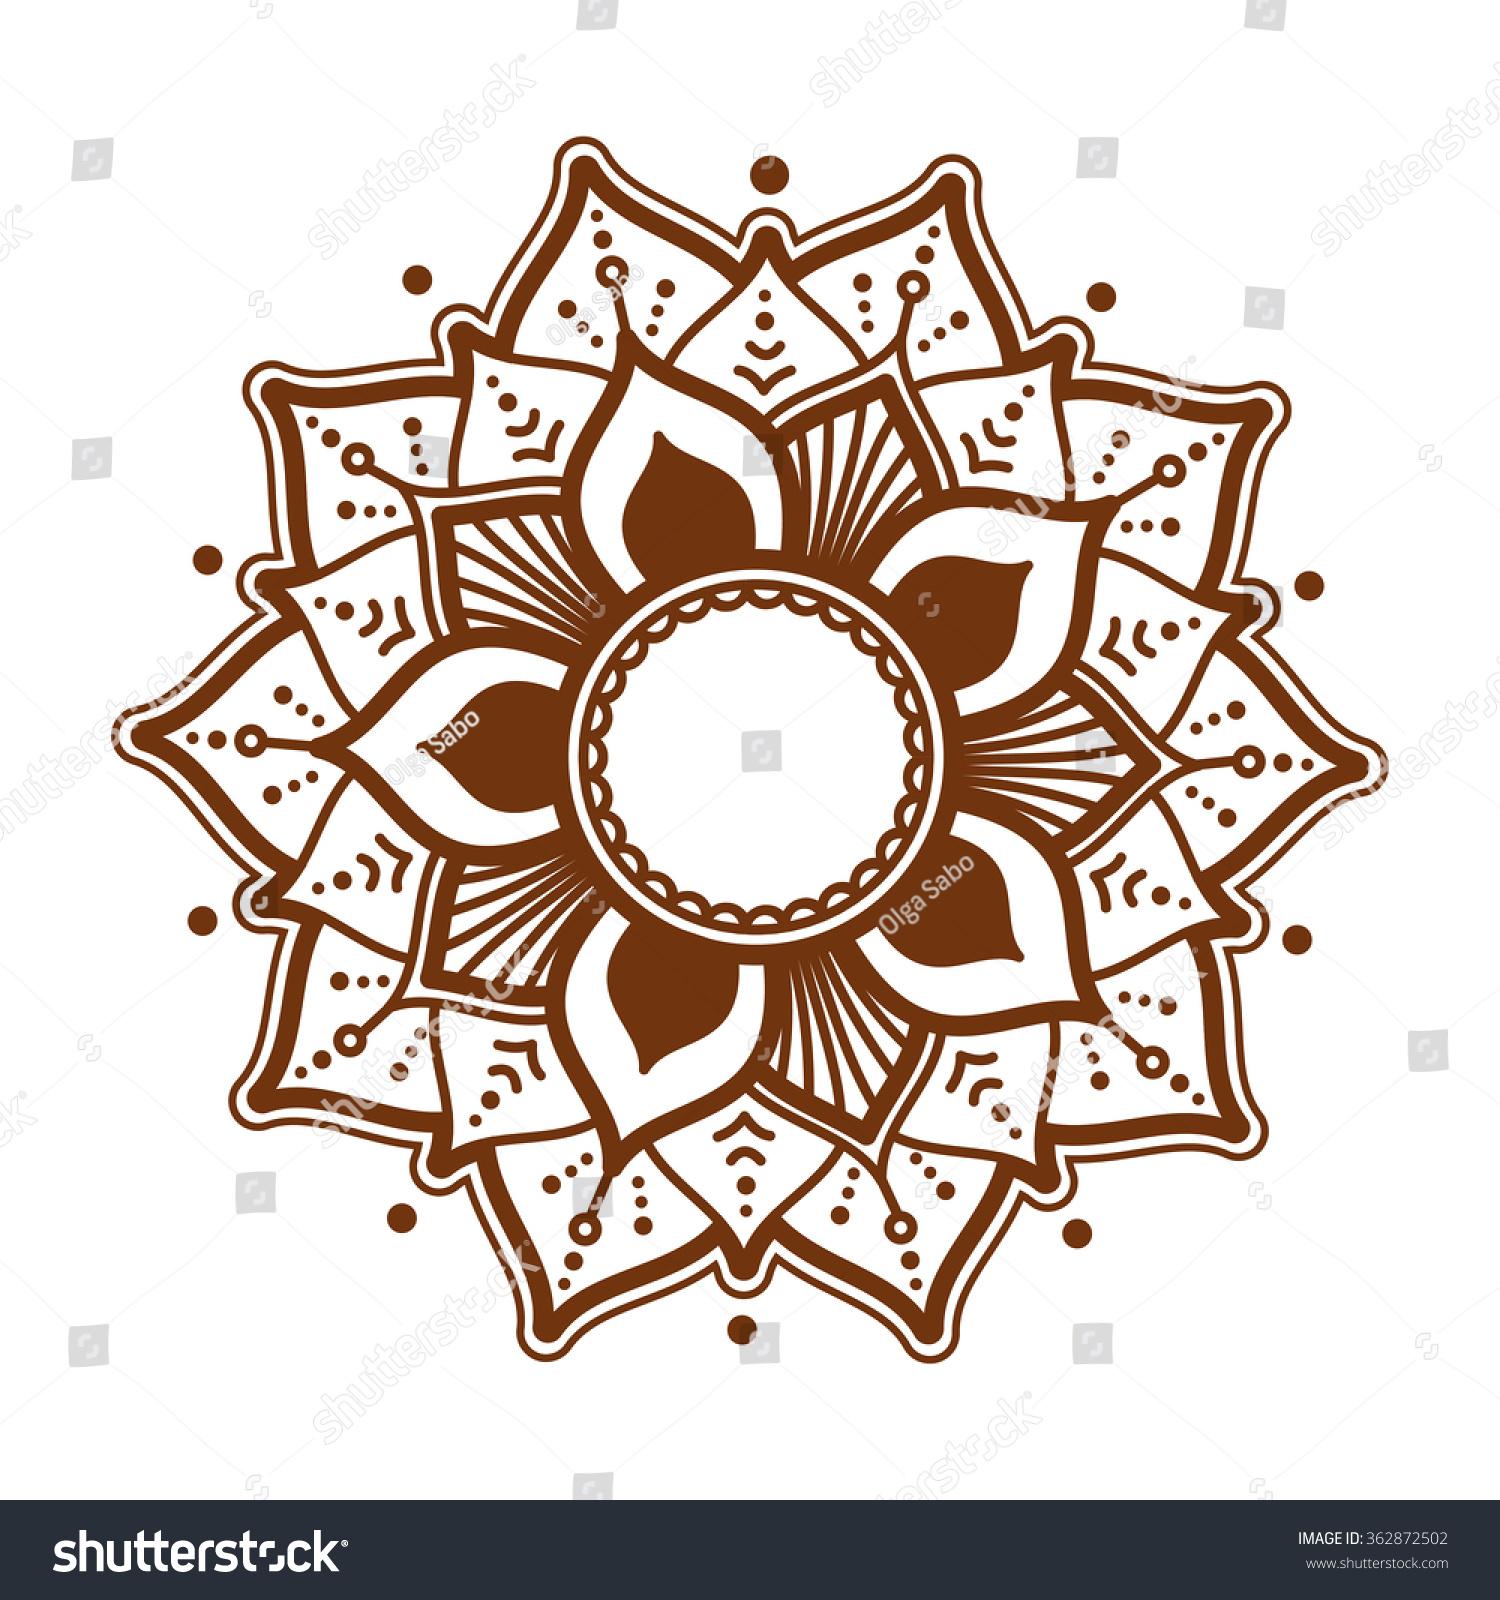 sahasrara chakra henna tattoo mehndi style stock. Black Bedroom Furniture Sets. Home Design Ideas